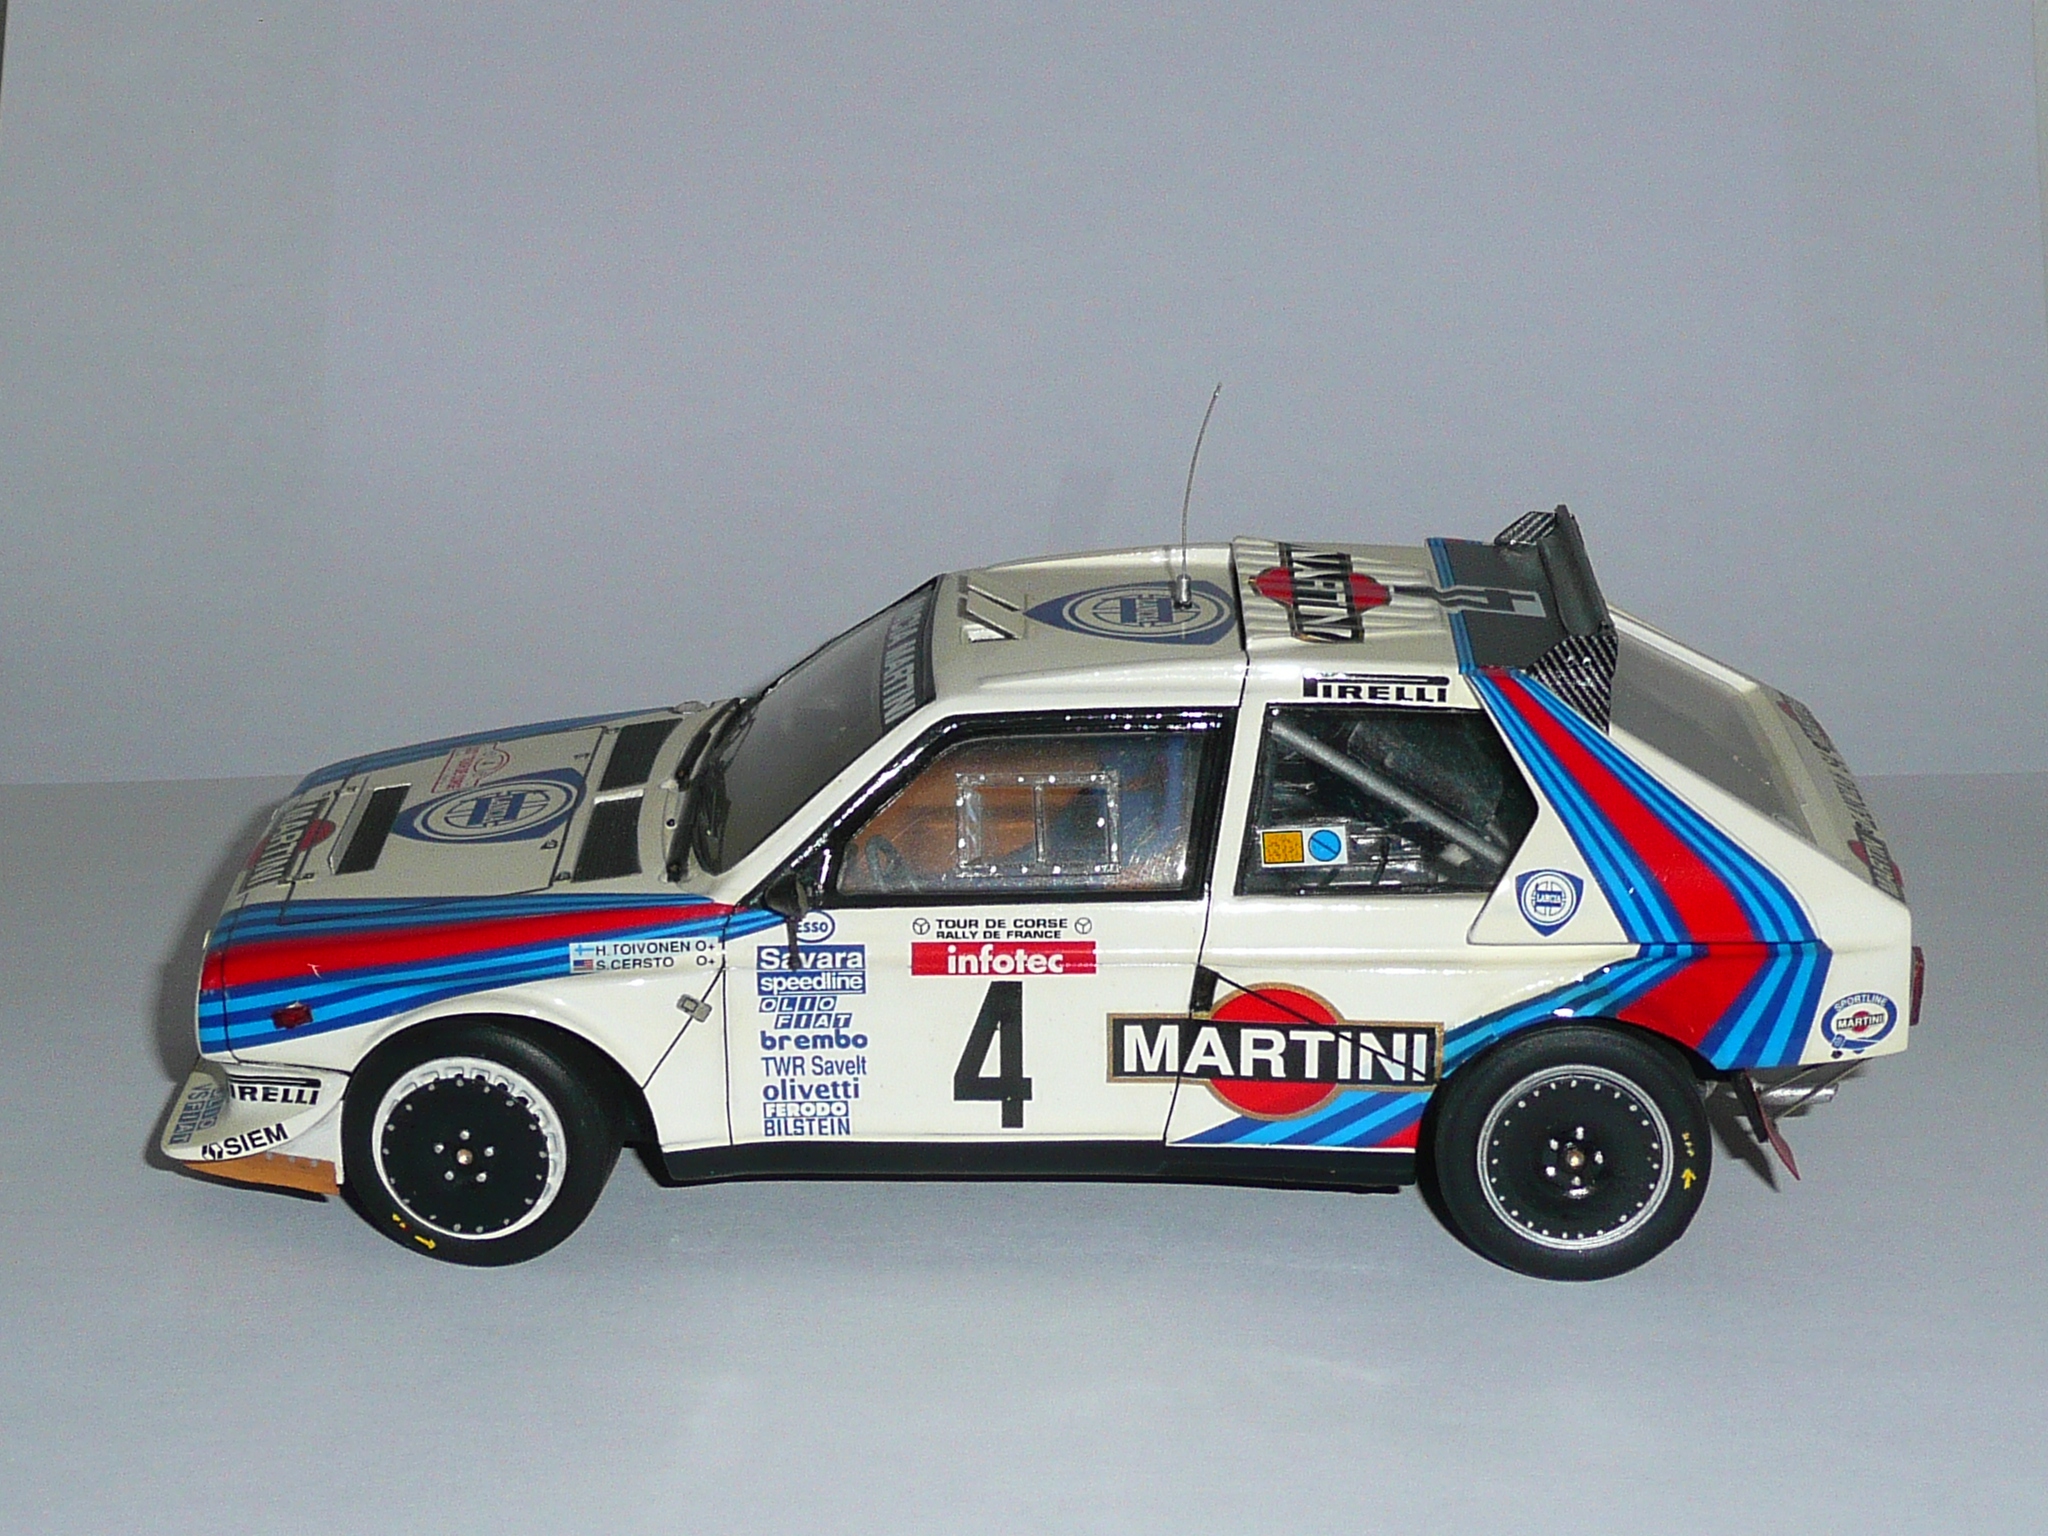 Lancia Delta S4 GrB - Henri Toivenen - Rallye Tour de Corse 1986 1/24